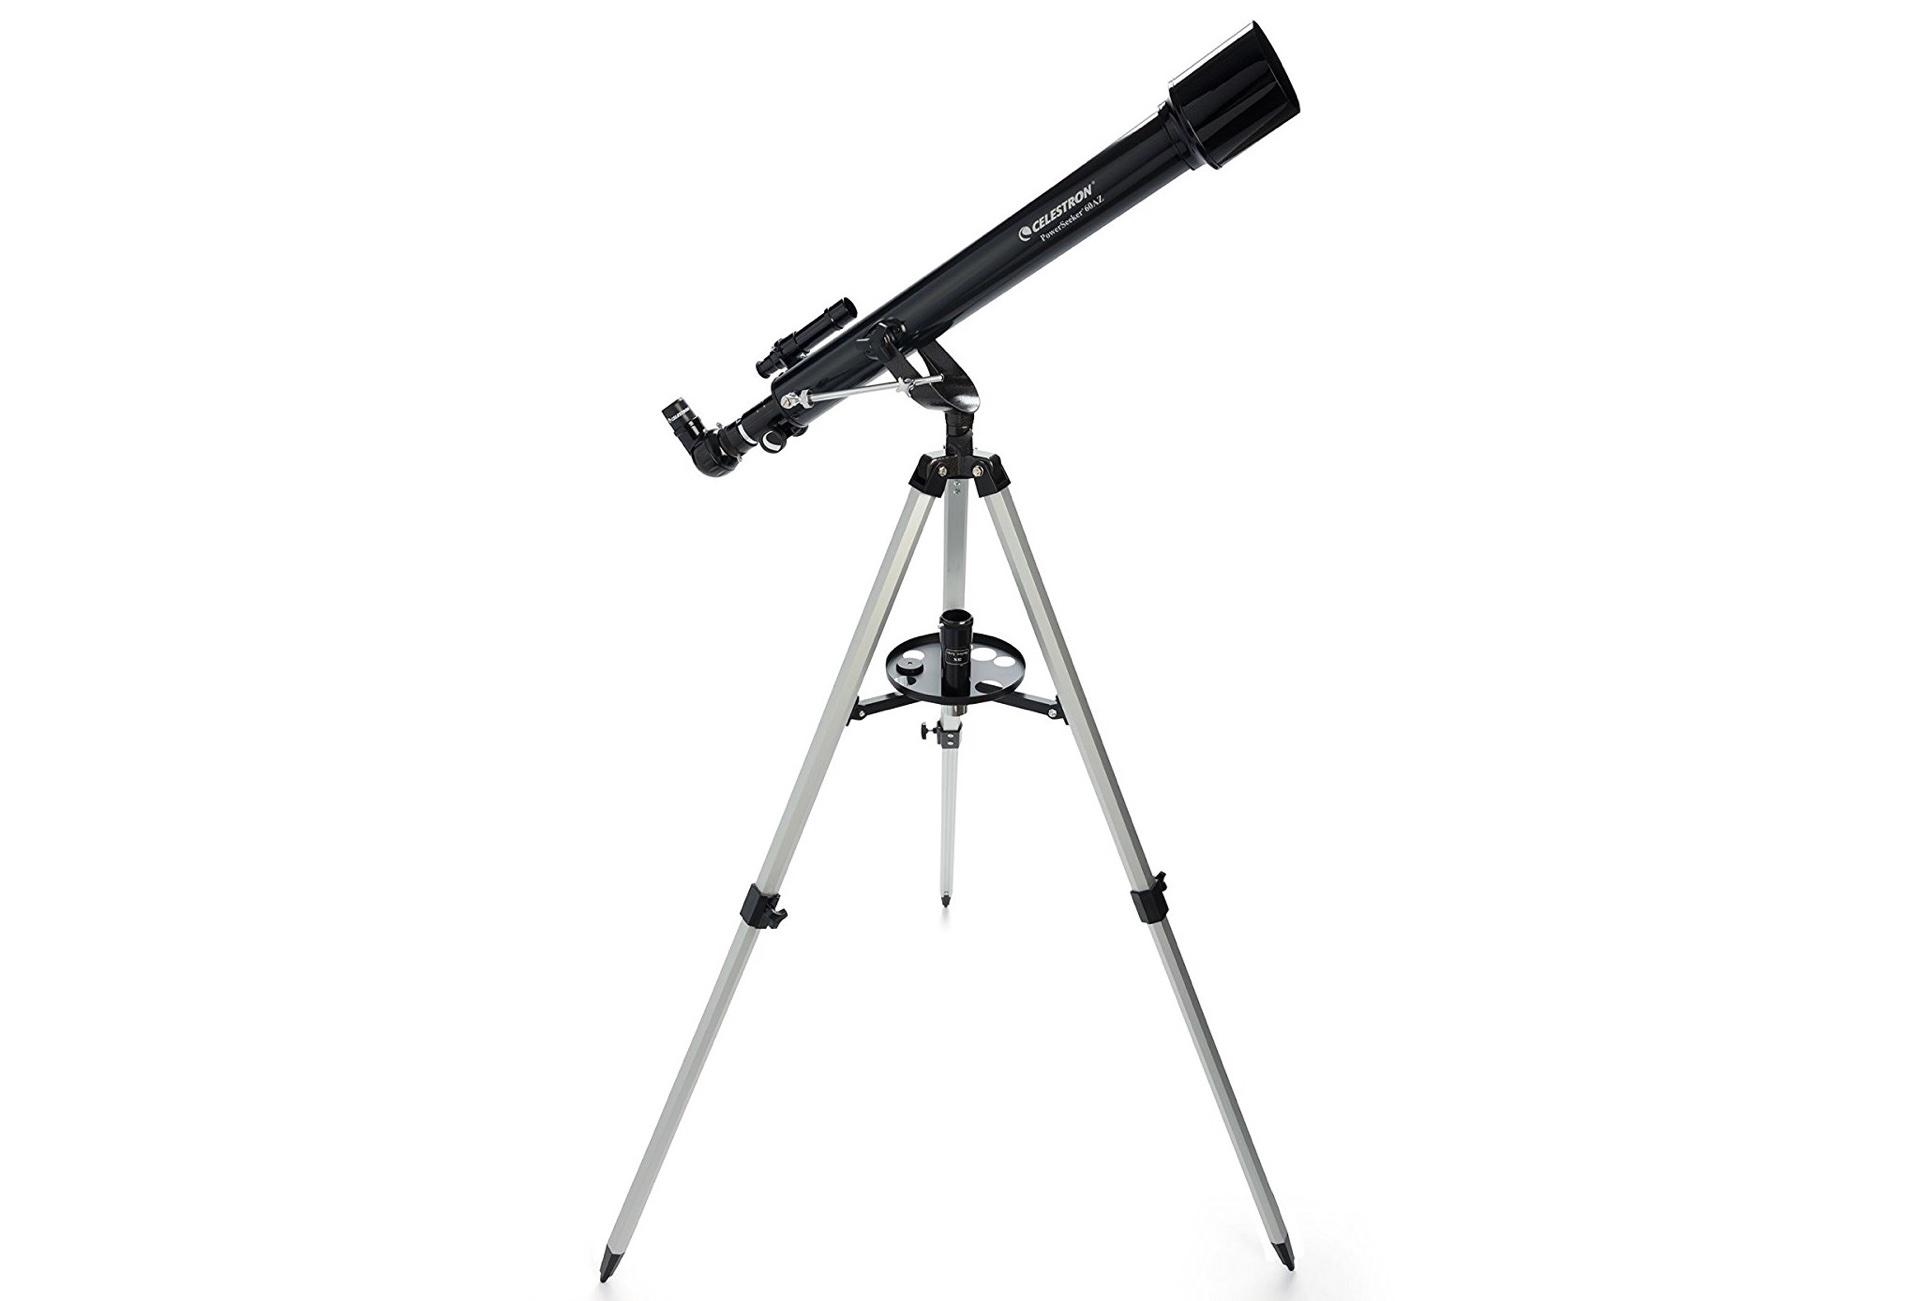 Celestron powerseeker 60az telescope u2014 tools and toys